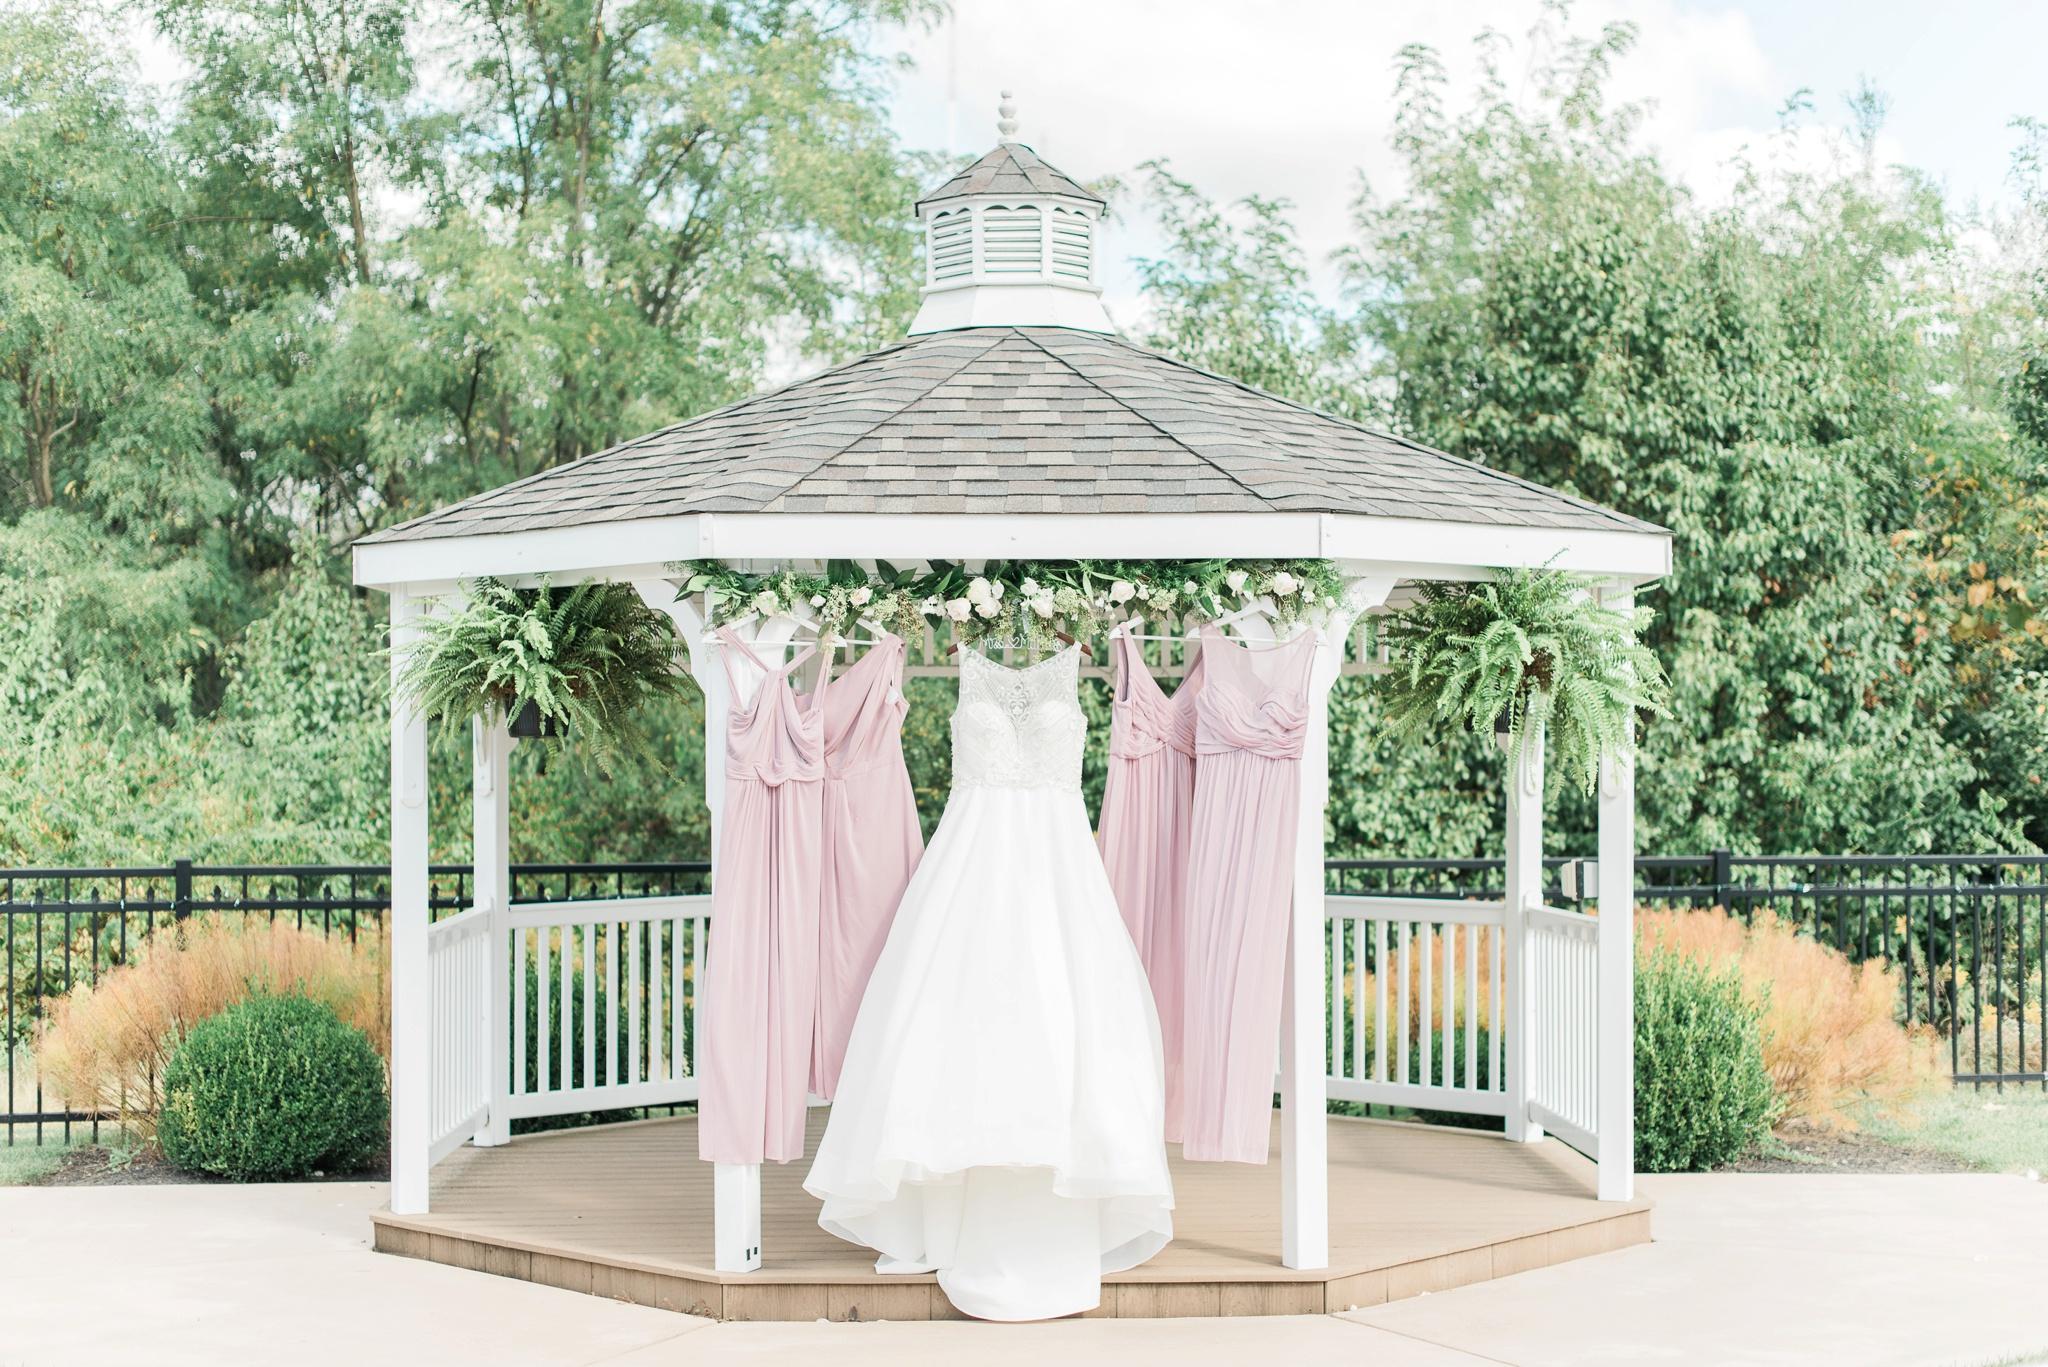 aladdin-shrine-center-wedding-grove-city-ohio-amber-jared_0002.jpg